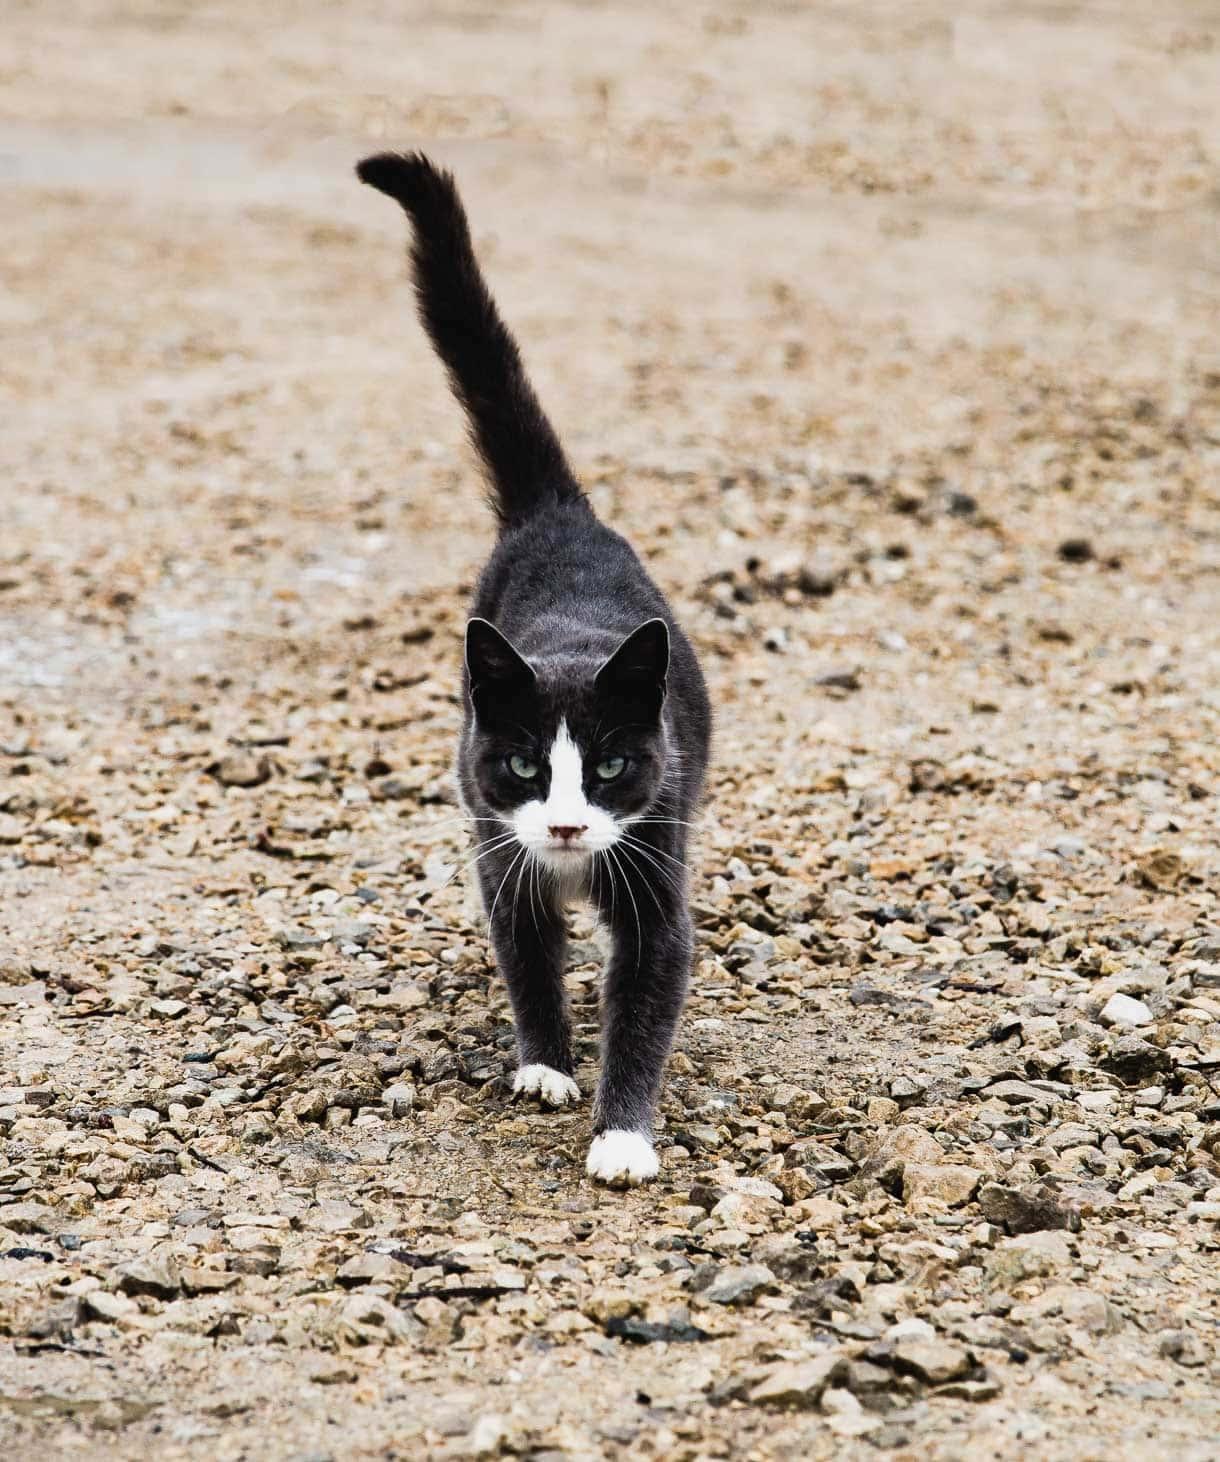 Farm cat, with white socks